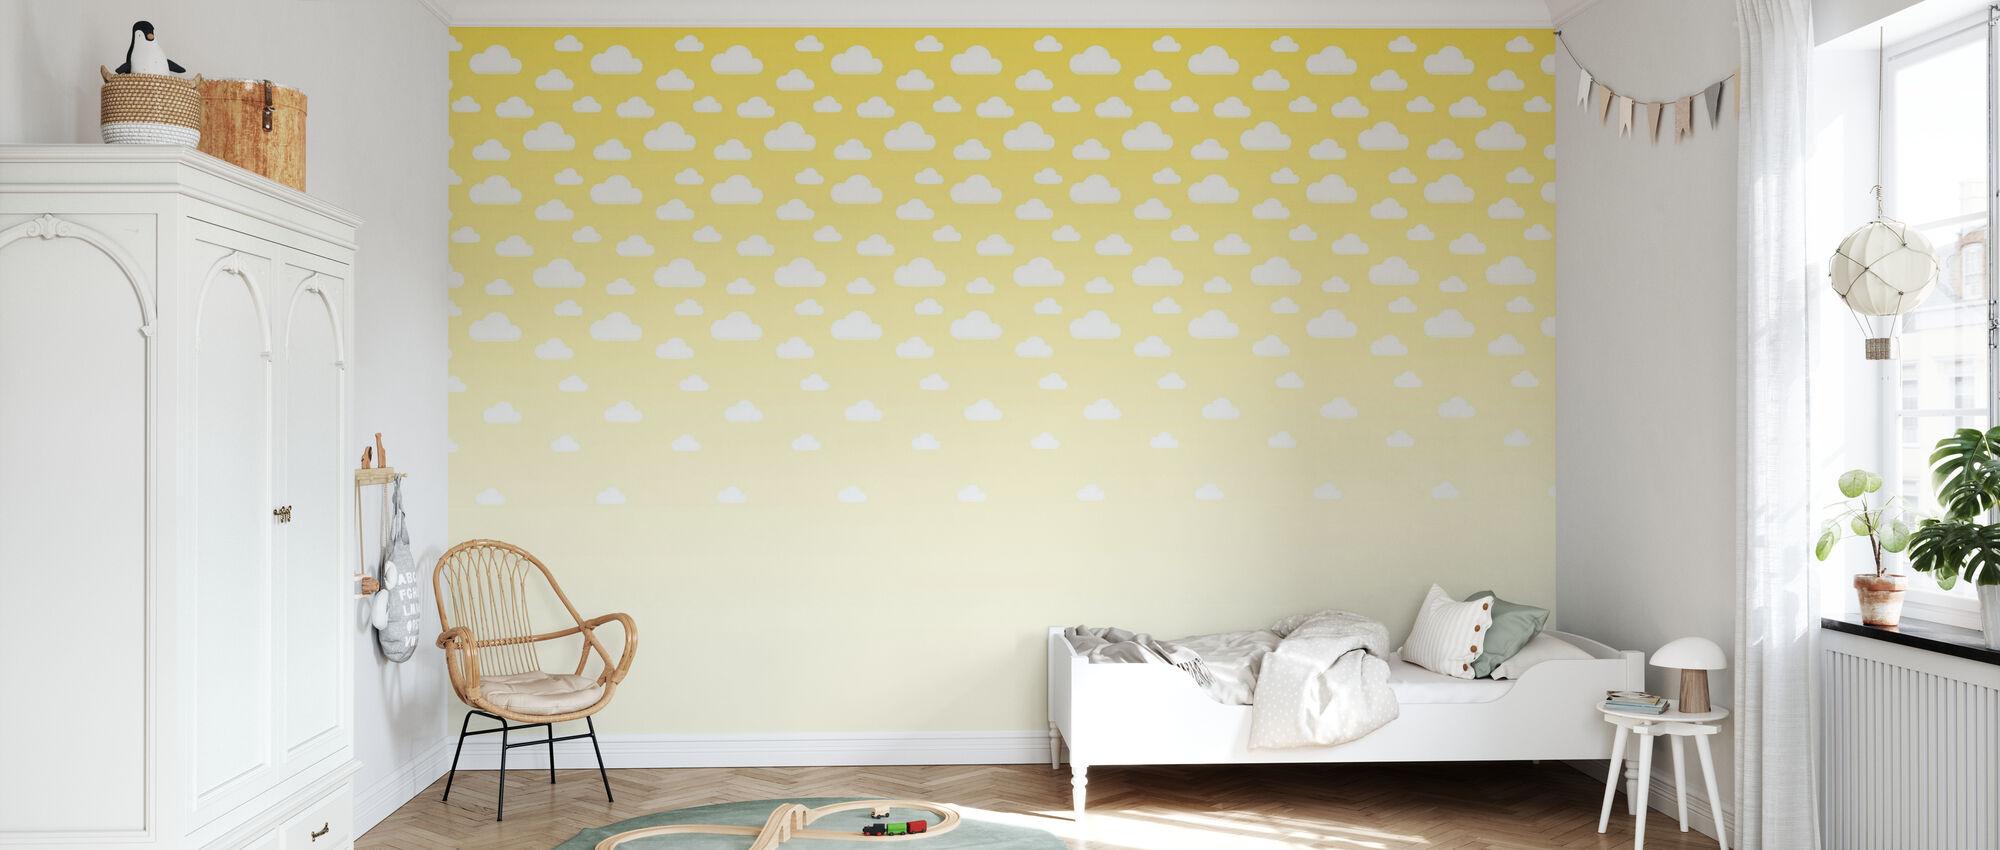 Cumulus - Yellow - Wallpaper - Kids Room